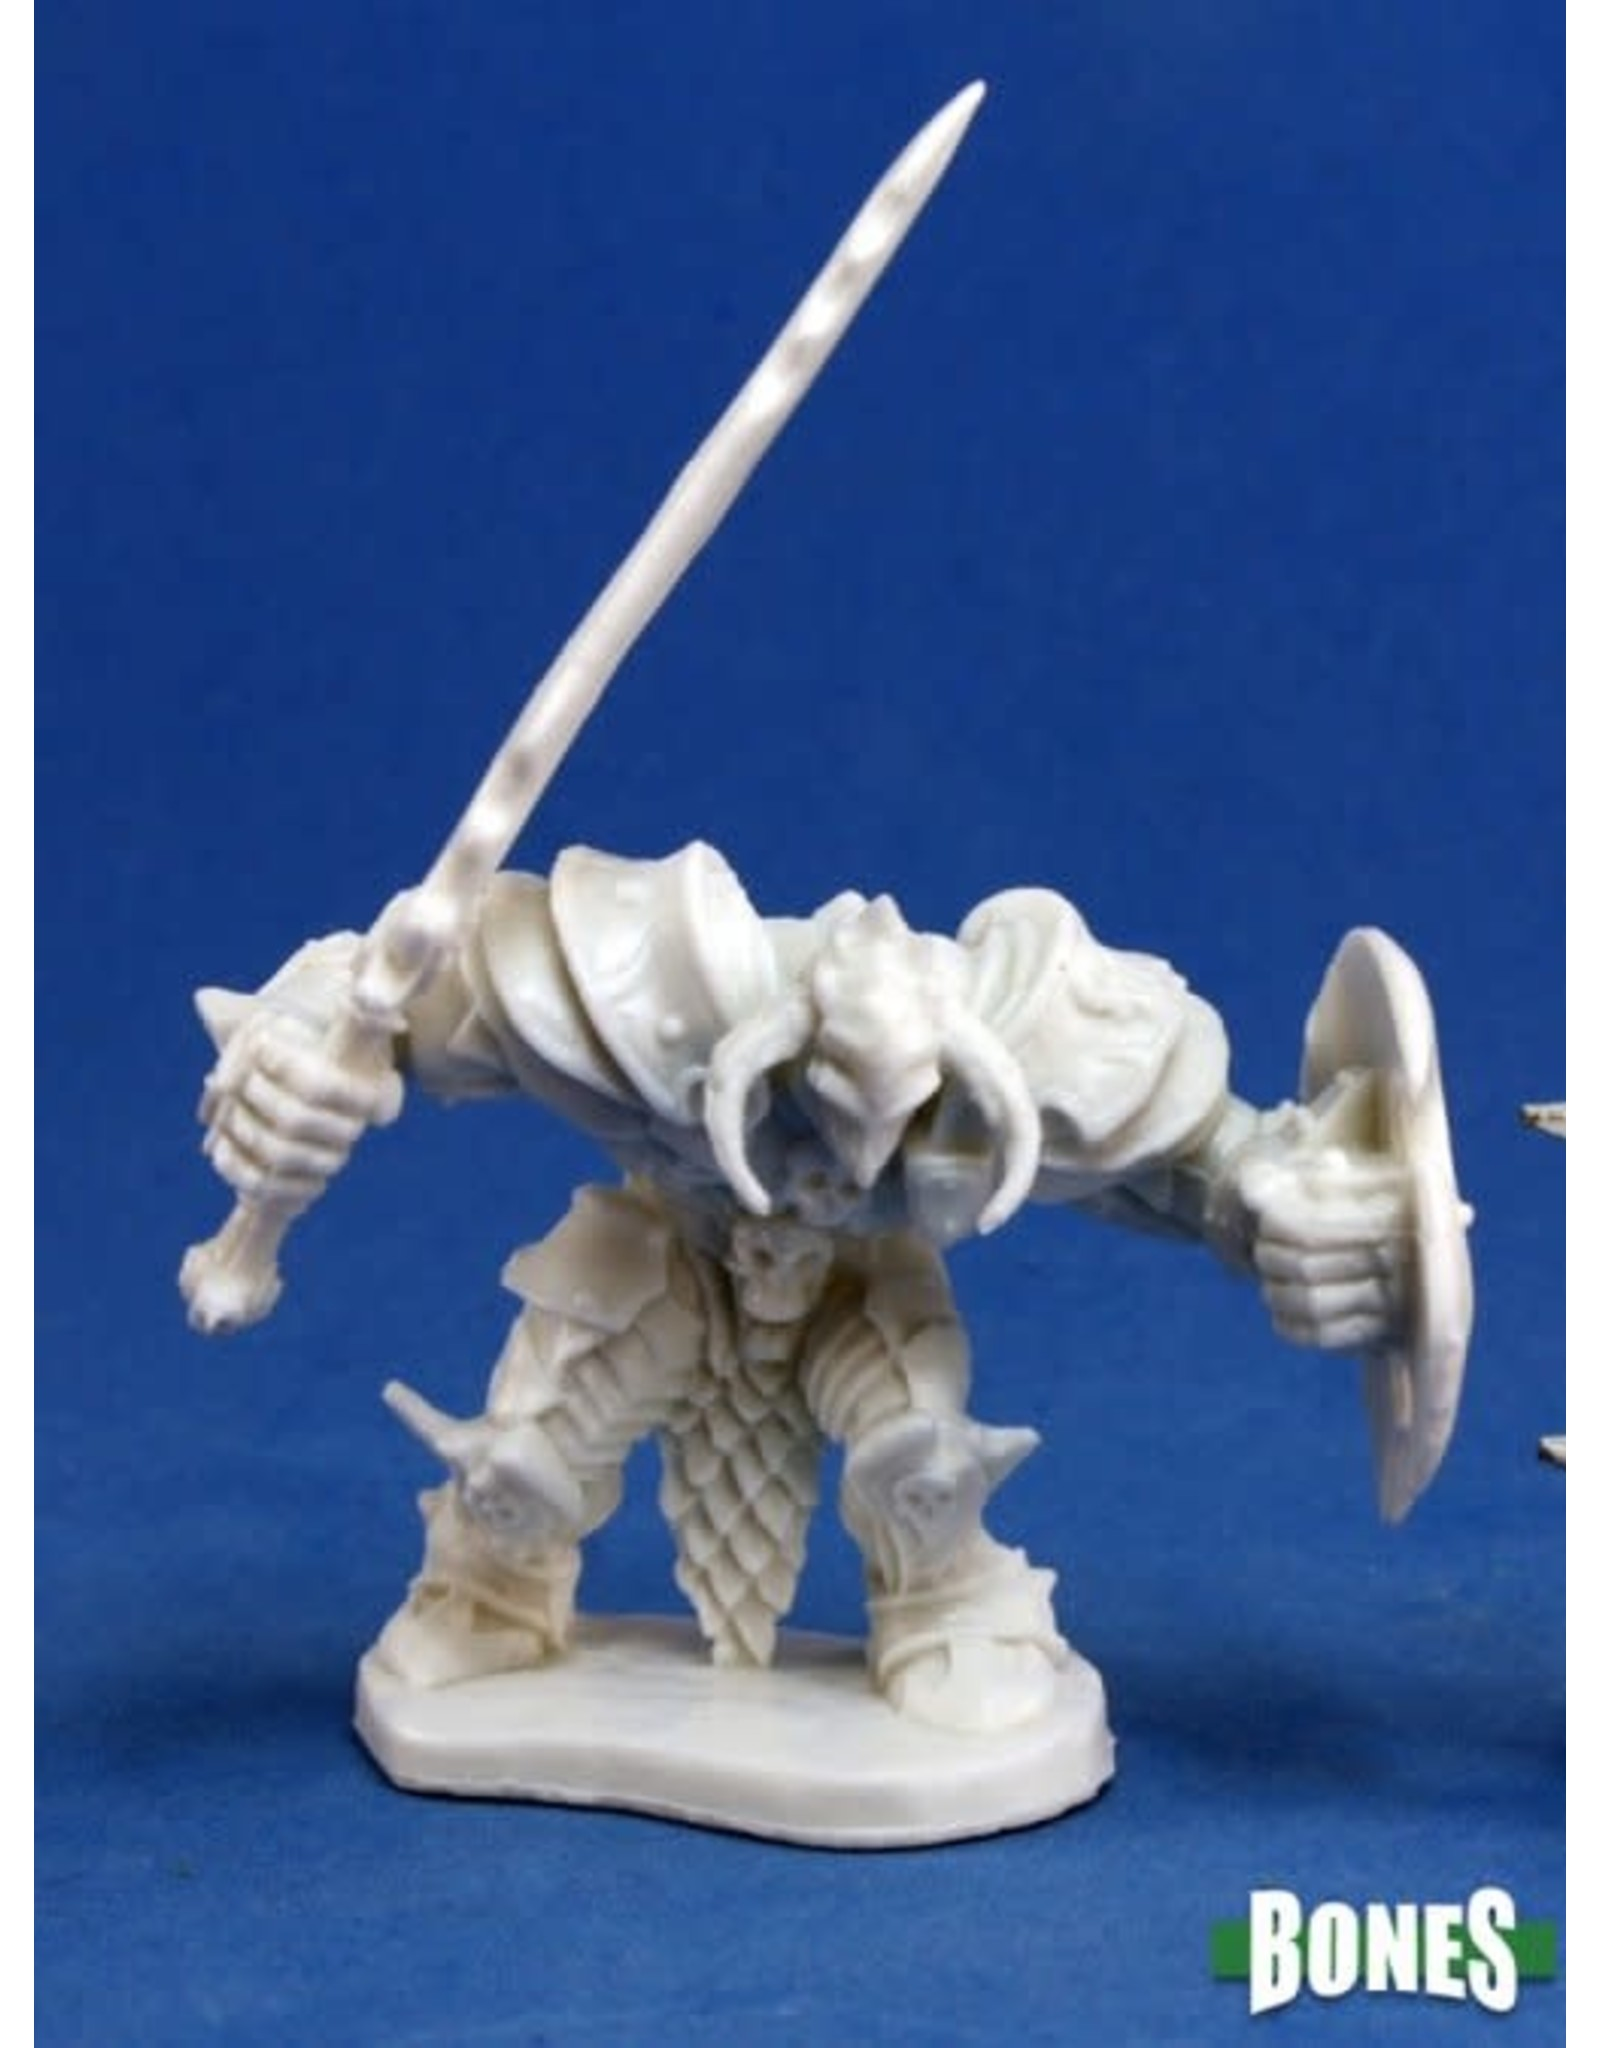 Reaper Miniatures Bones: Ragnaros, Evil Warrior